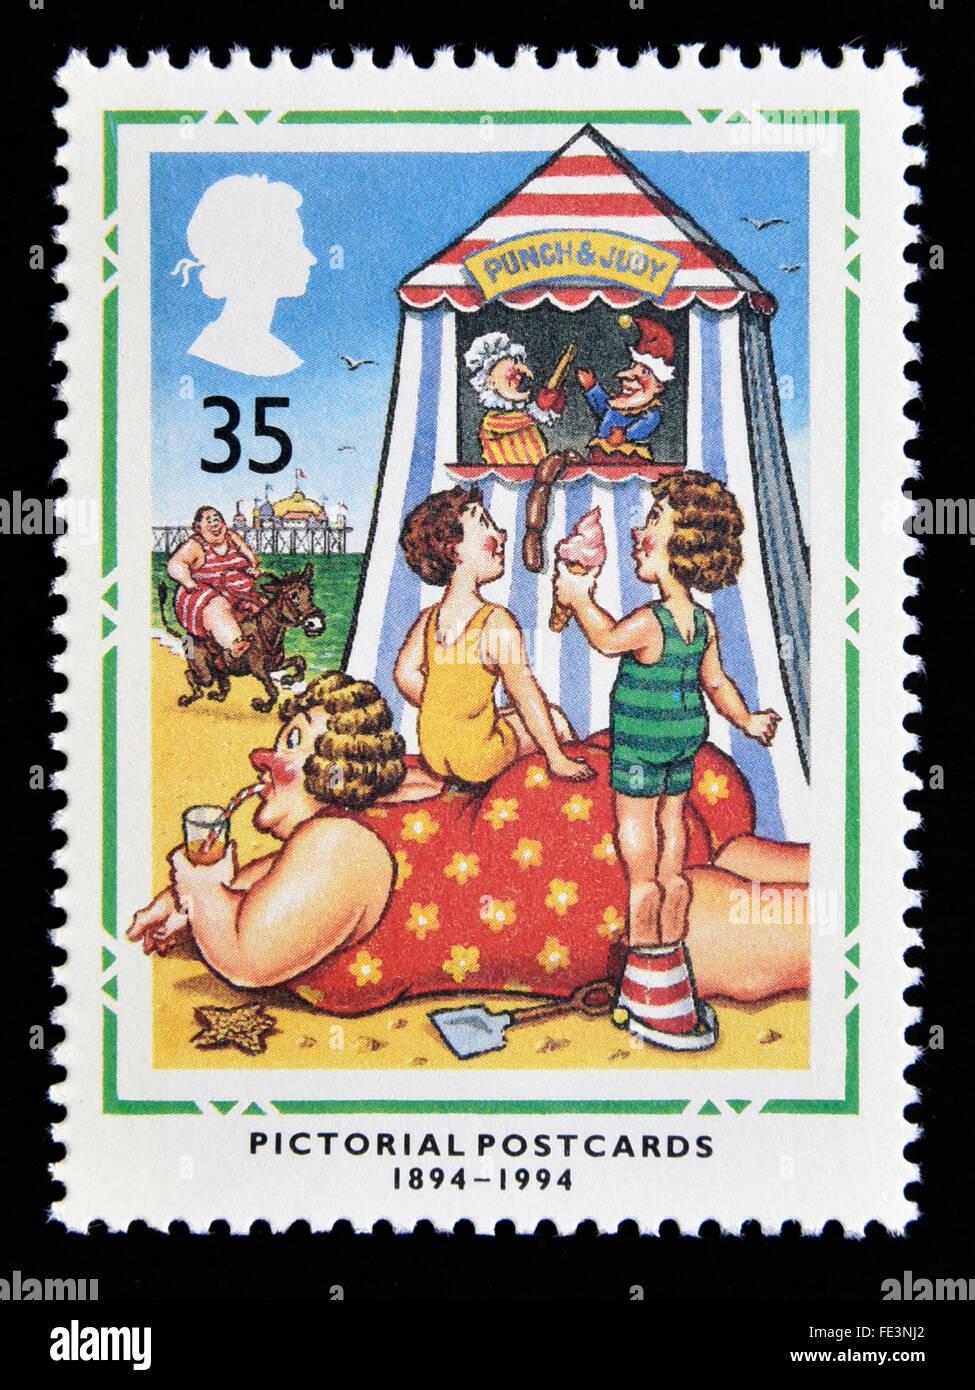 Postage stamp. Great Britain. Queen Elizabeth II. 1994. Centenary of Pictorial Postcards. 1894-1994. 35p. - Stock Image